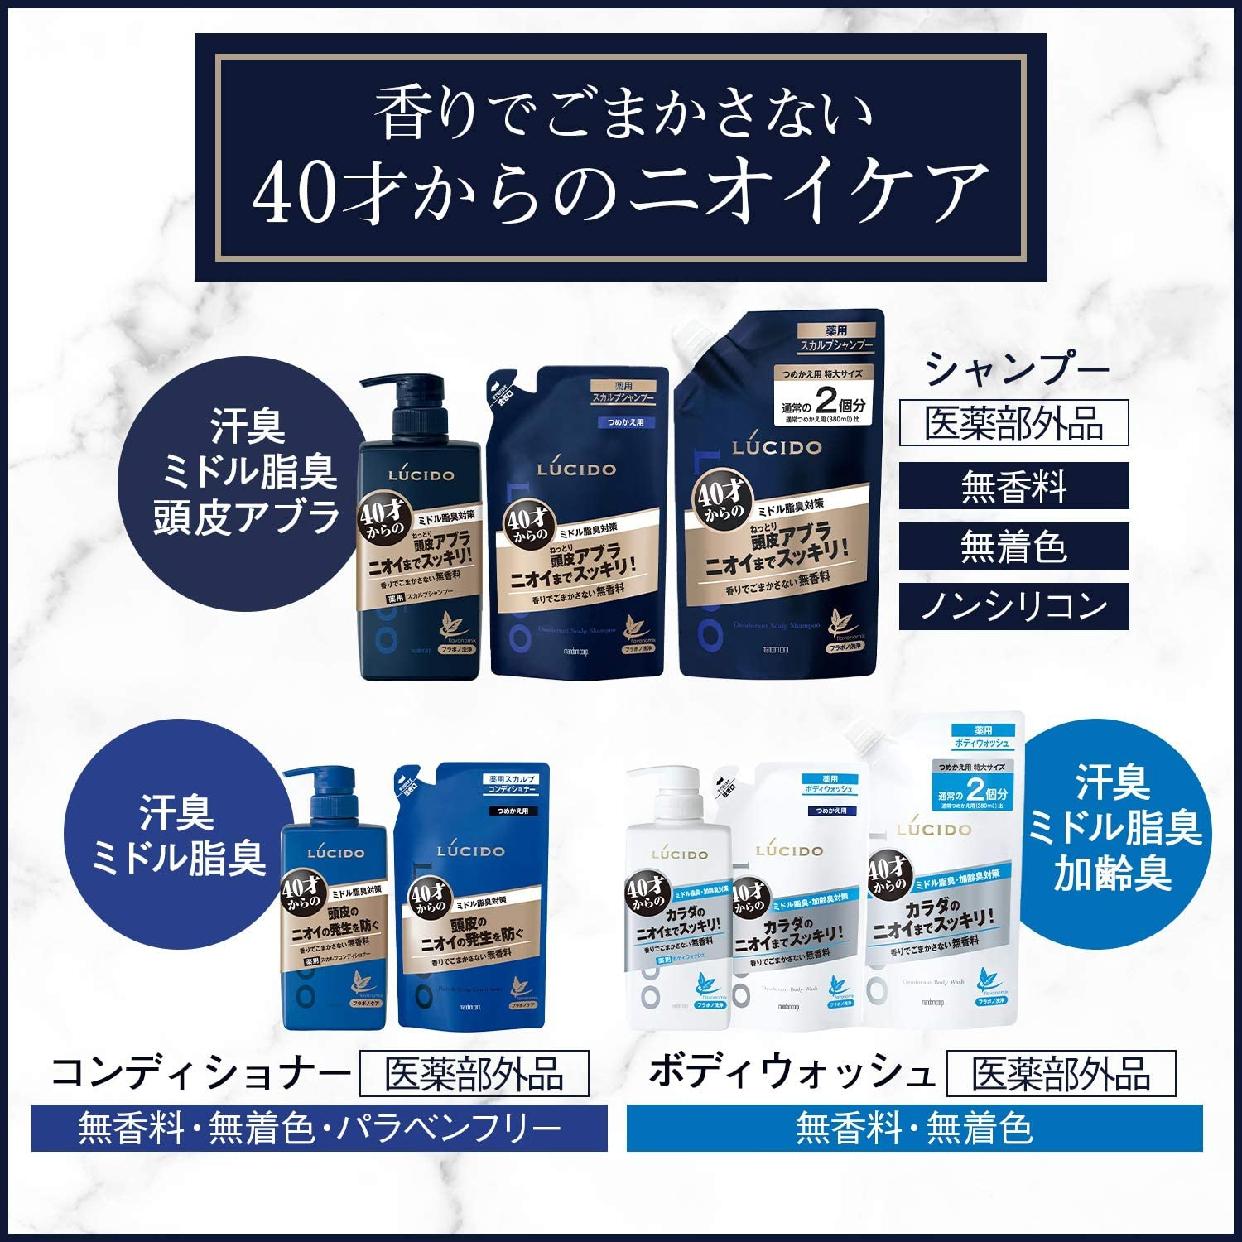 LUCIDO(ルシード) 薬用スカルプデオシャンプーの商品画像11